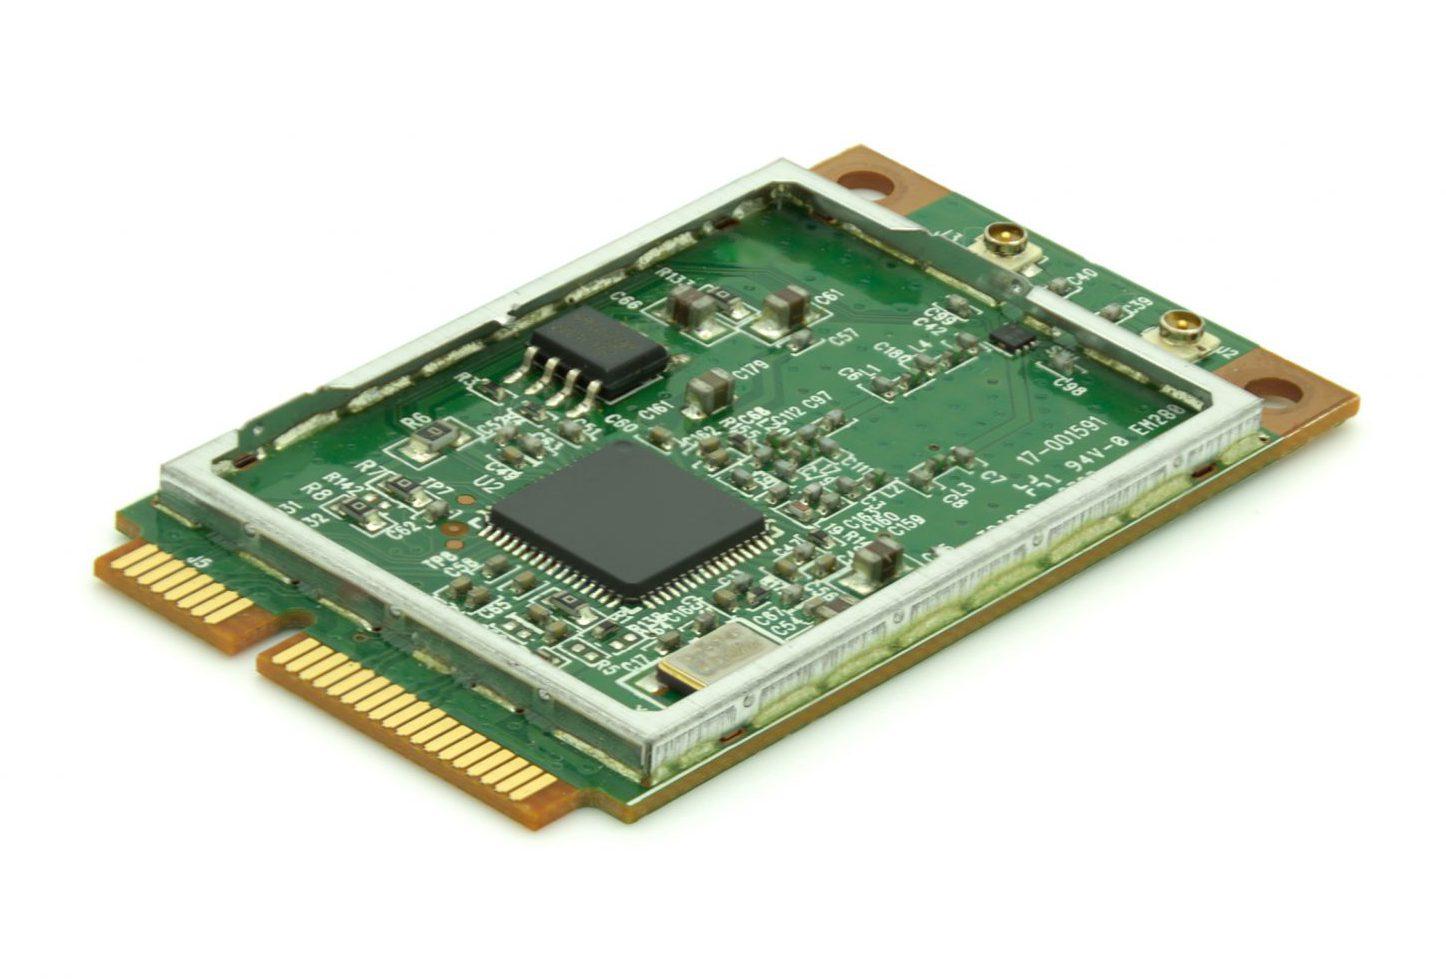 Mini PCIe card